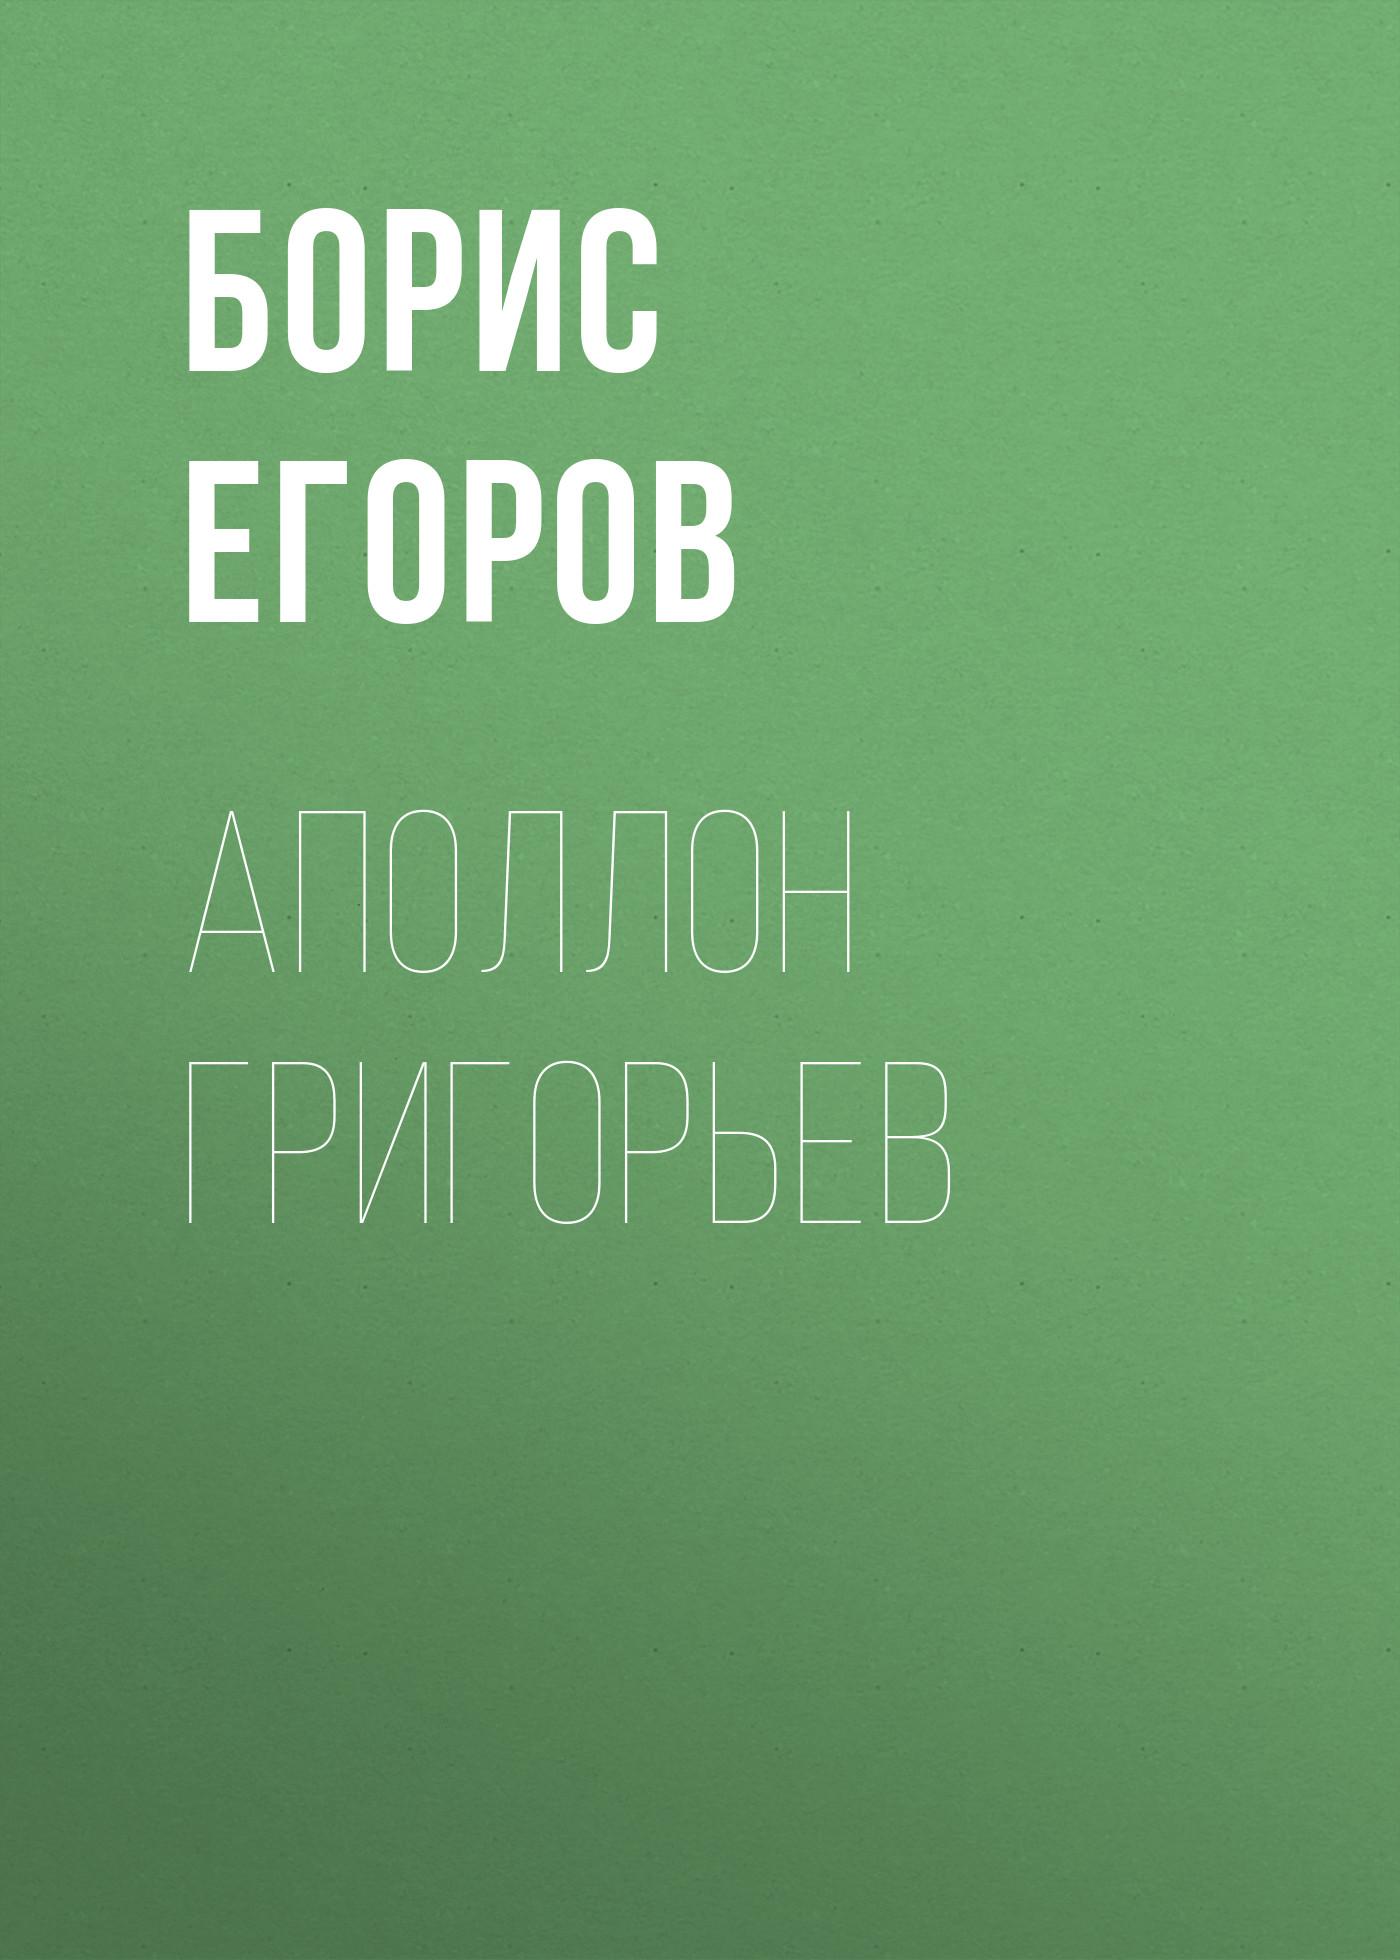 Борис Егоров Аполлон Григорьев борис егоров аполлон григорьев